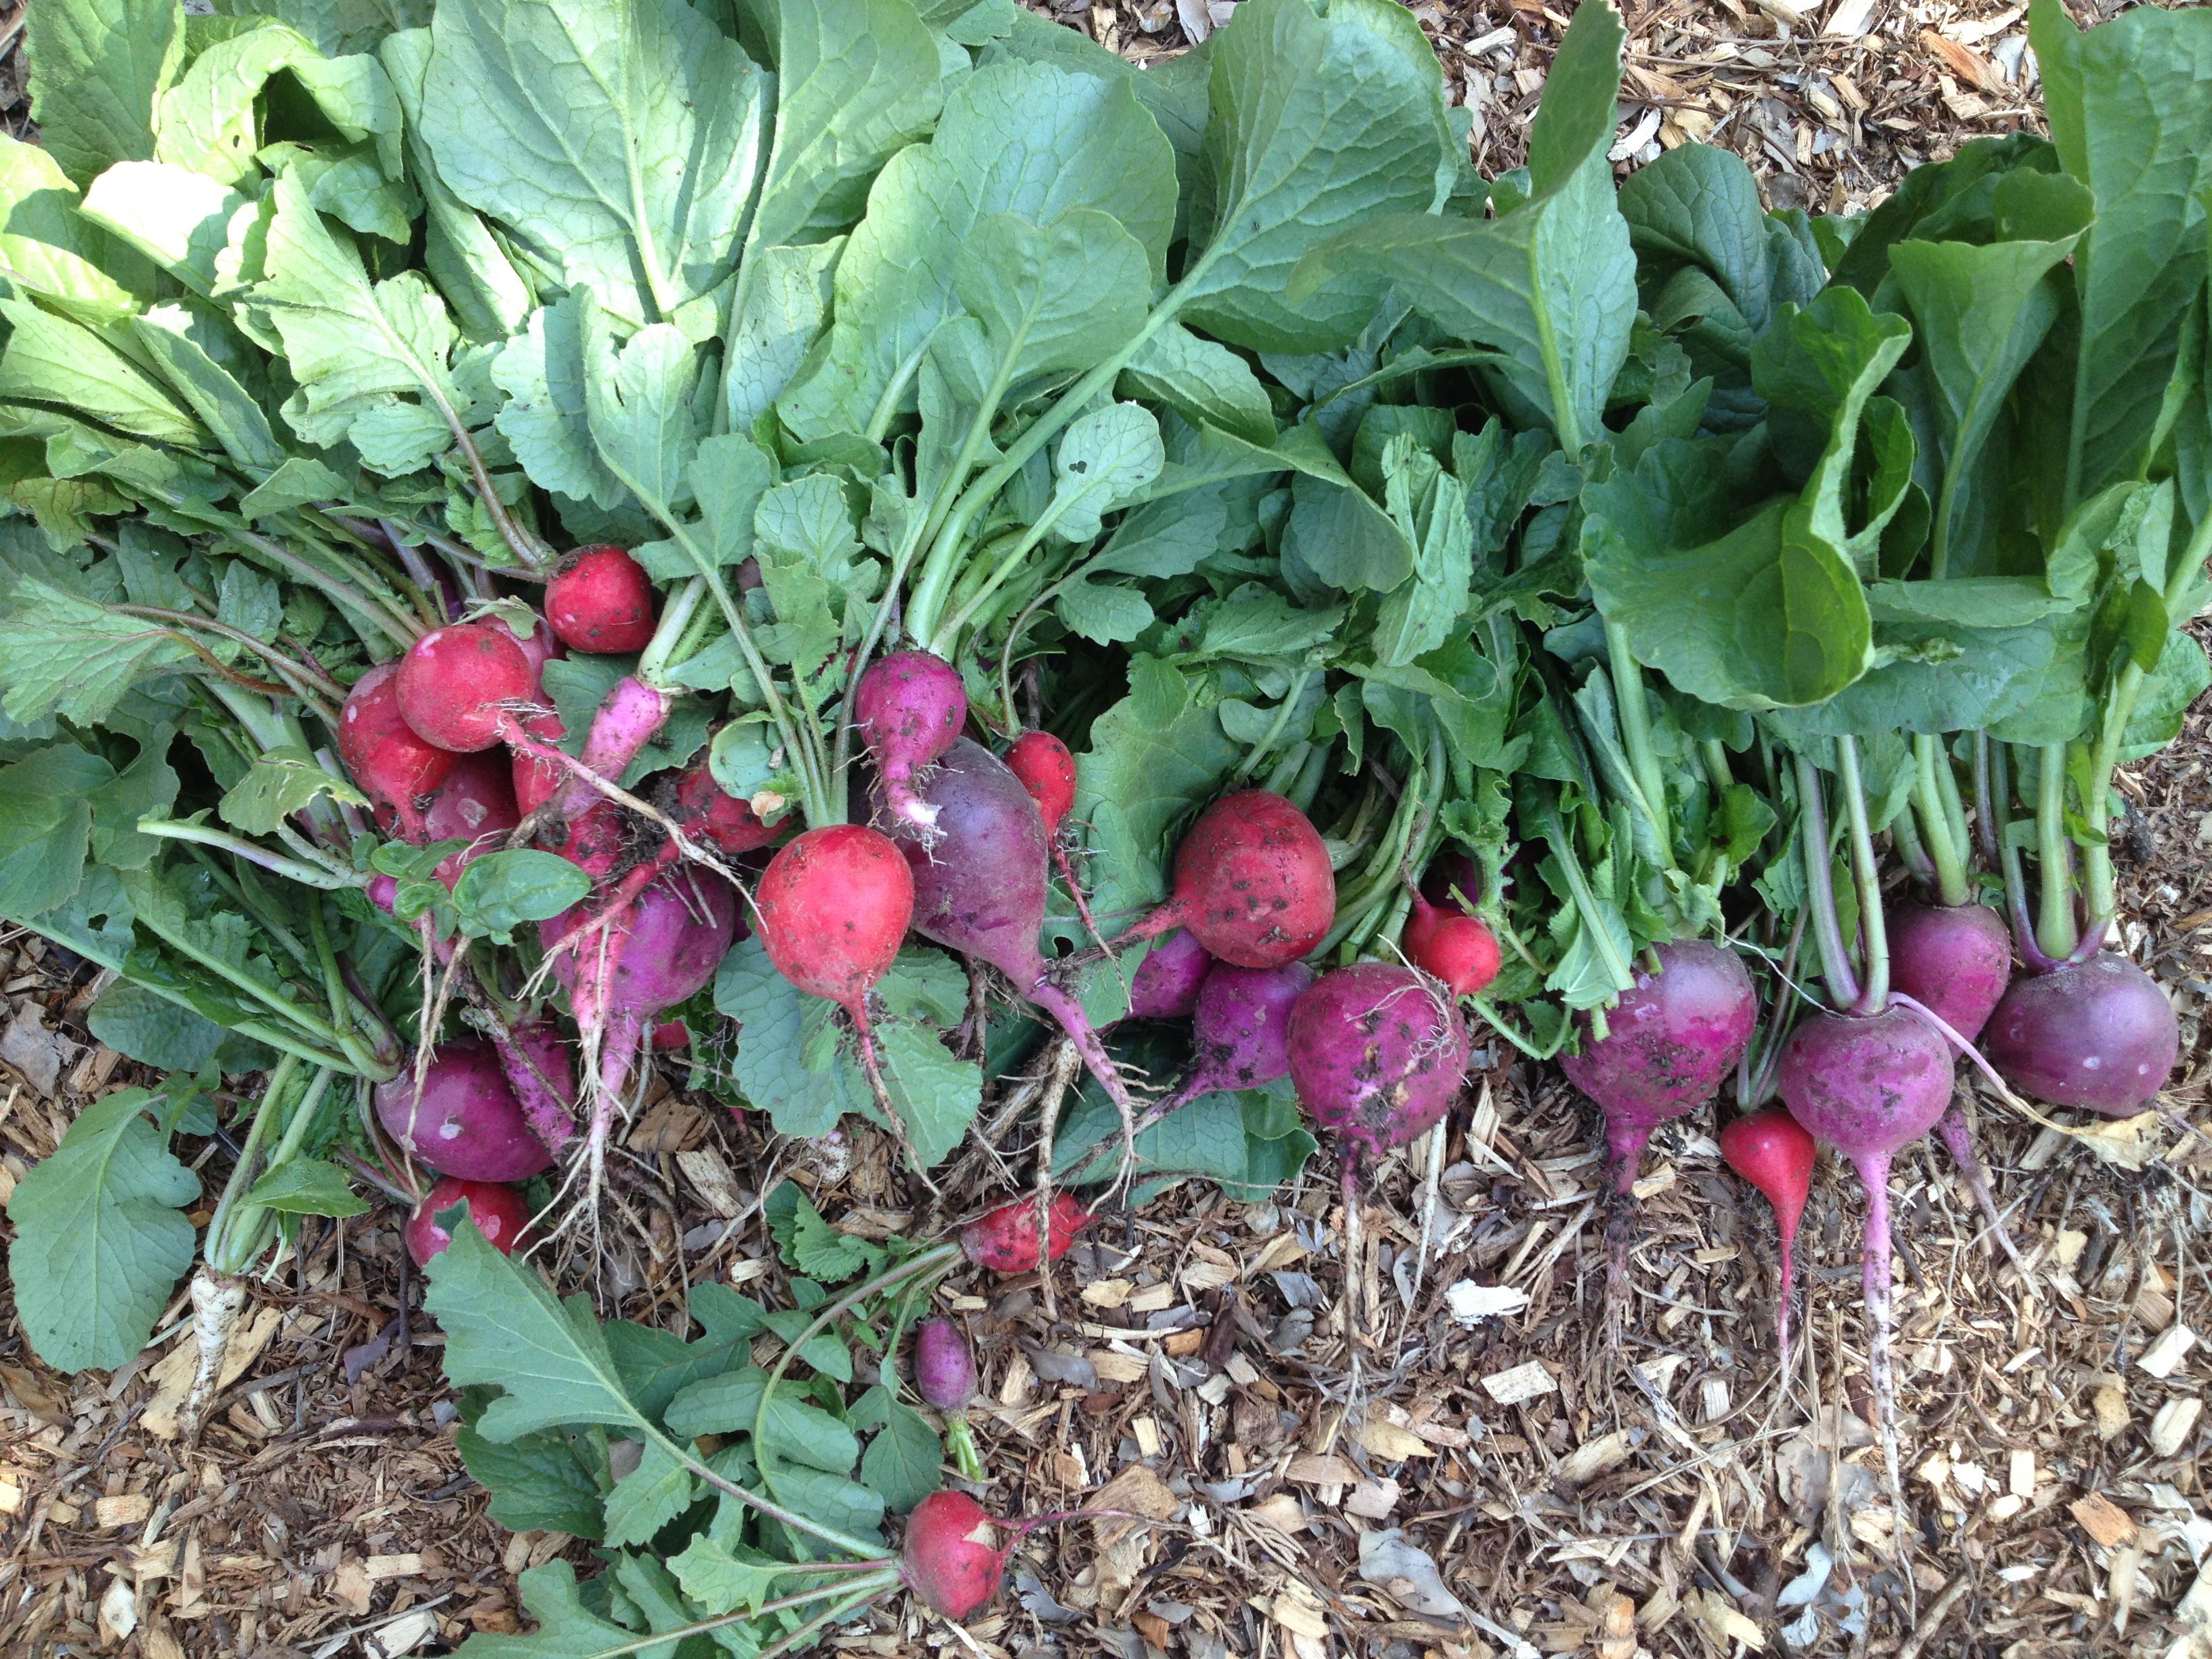 como plantar beterraba orgânica : como plantar beterraba em canteiro